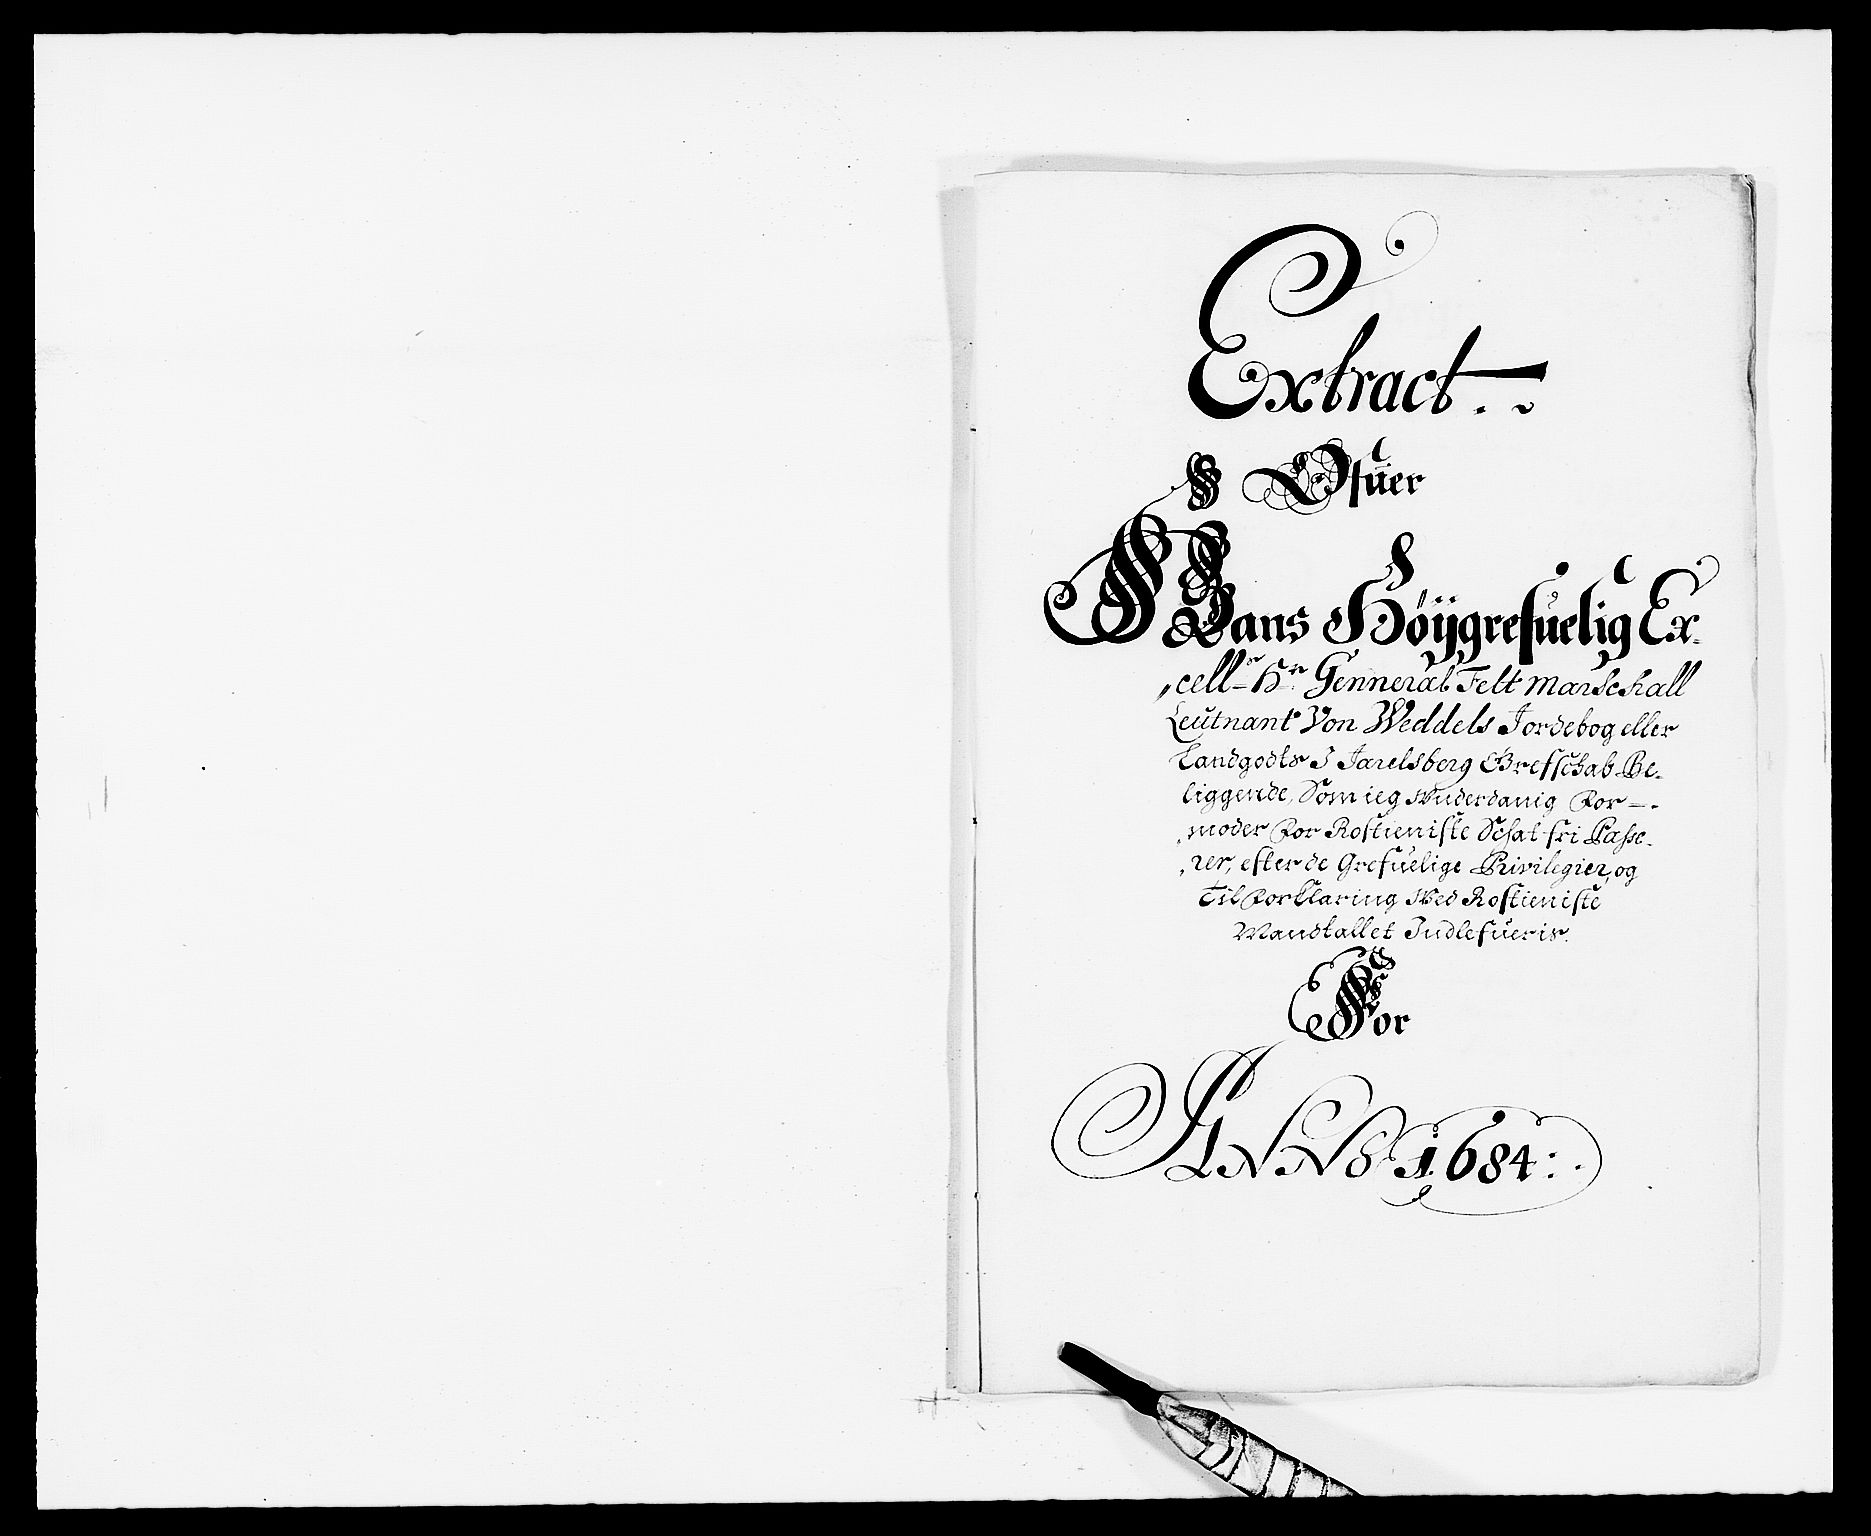 RA, Rentekammeret inntil 1814, Reviderte regnskaper, Fogderegnskap, R32/L1855: Fogderegnskap Jarlsberg grevskap, 1684, s. 91